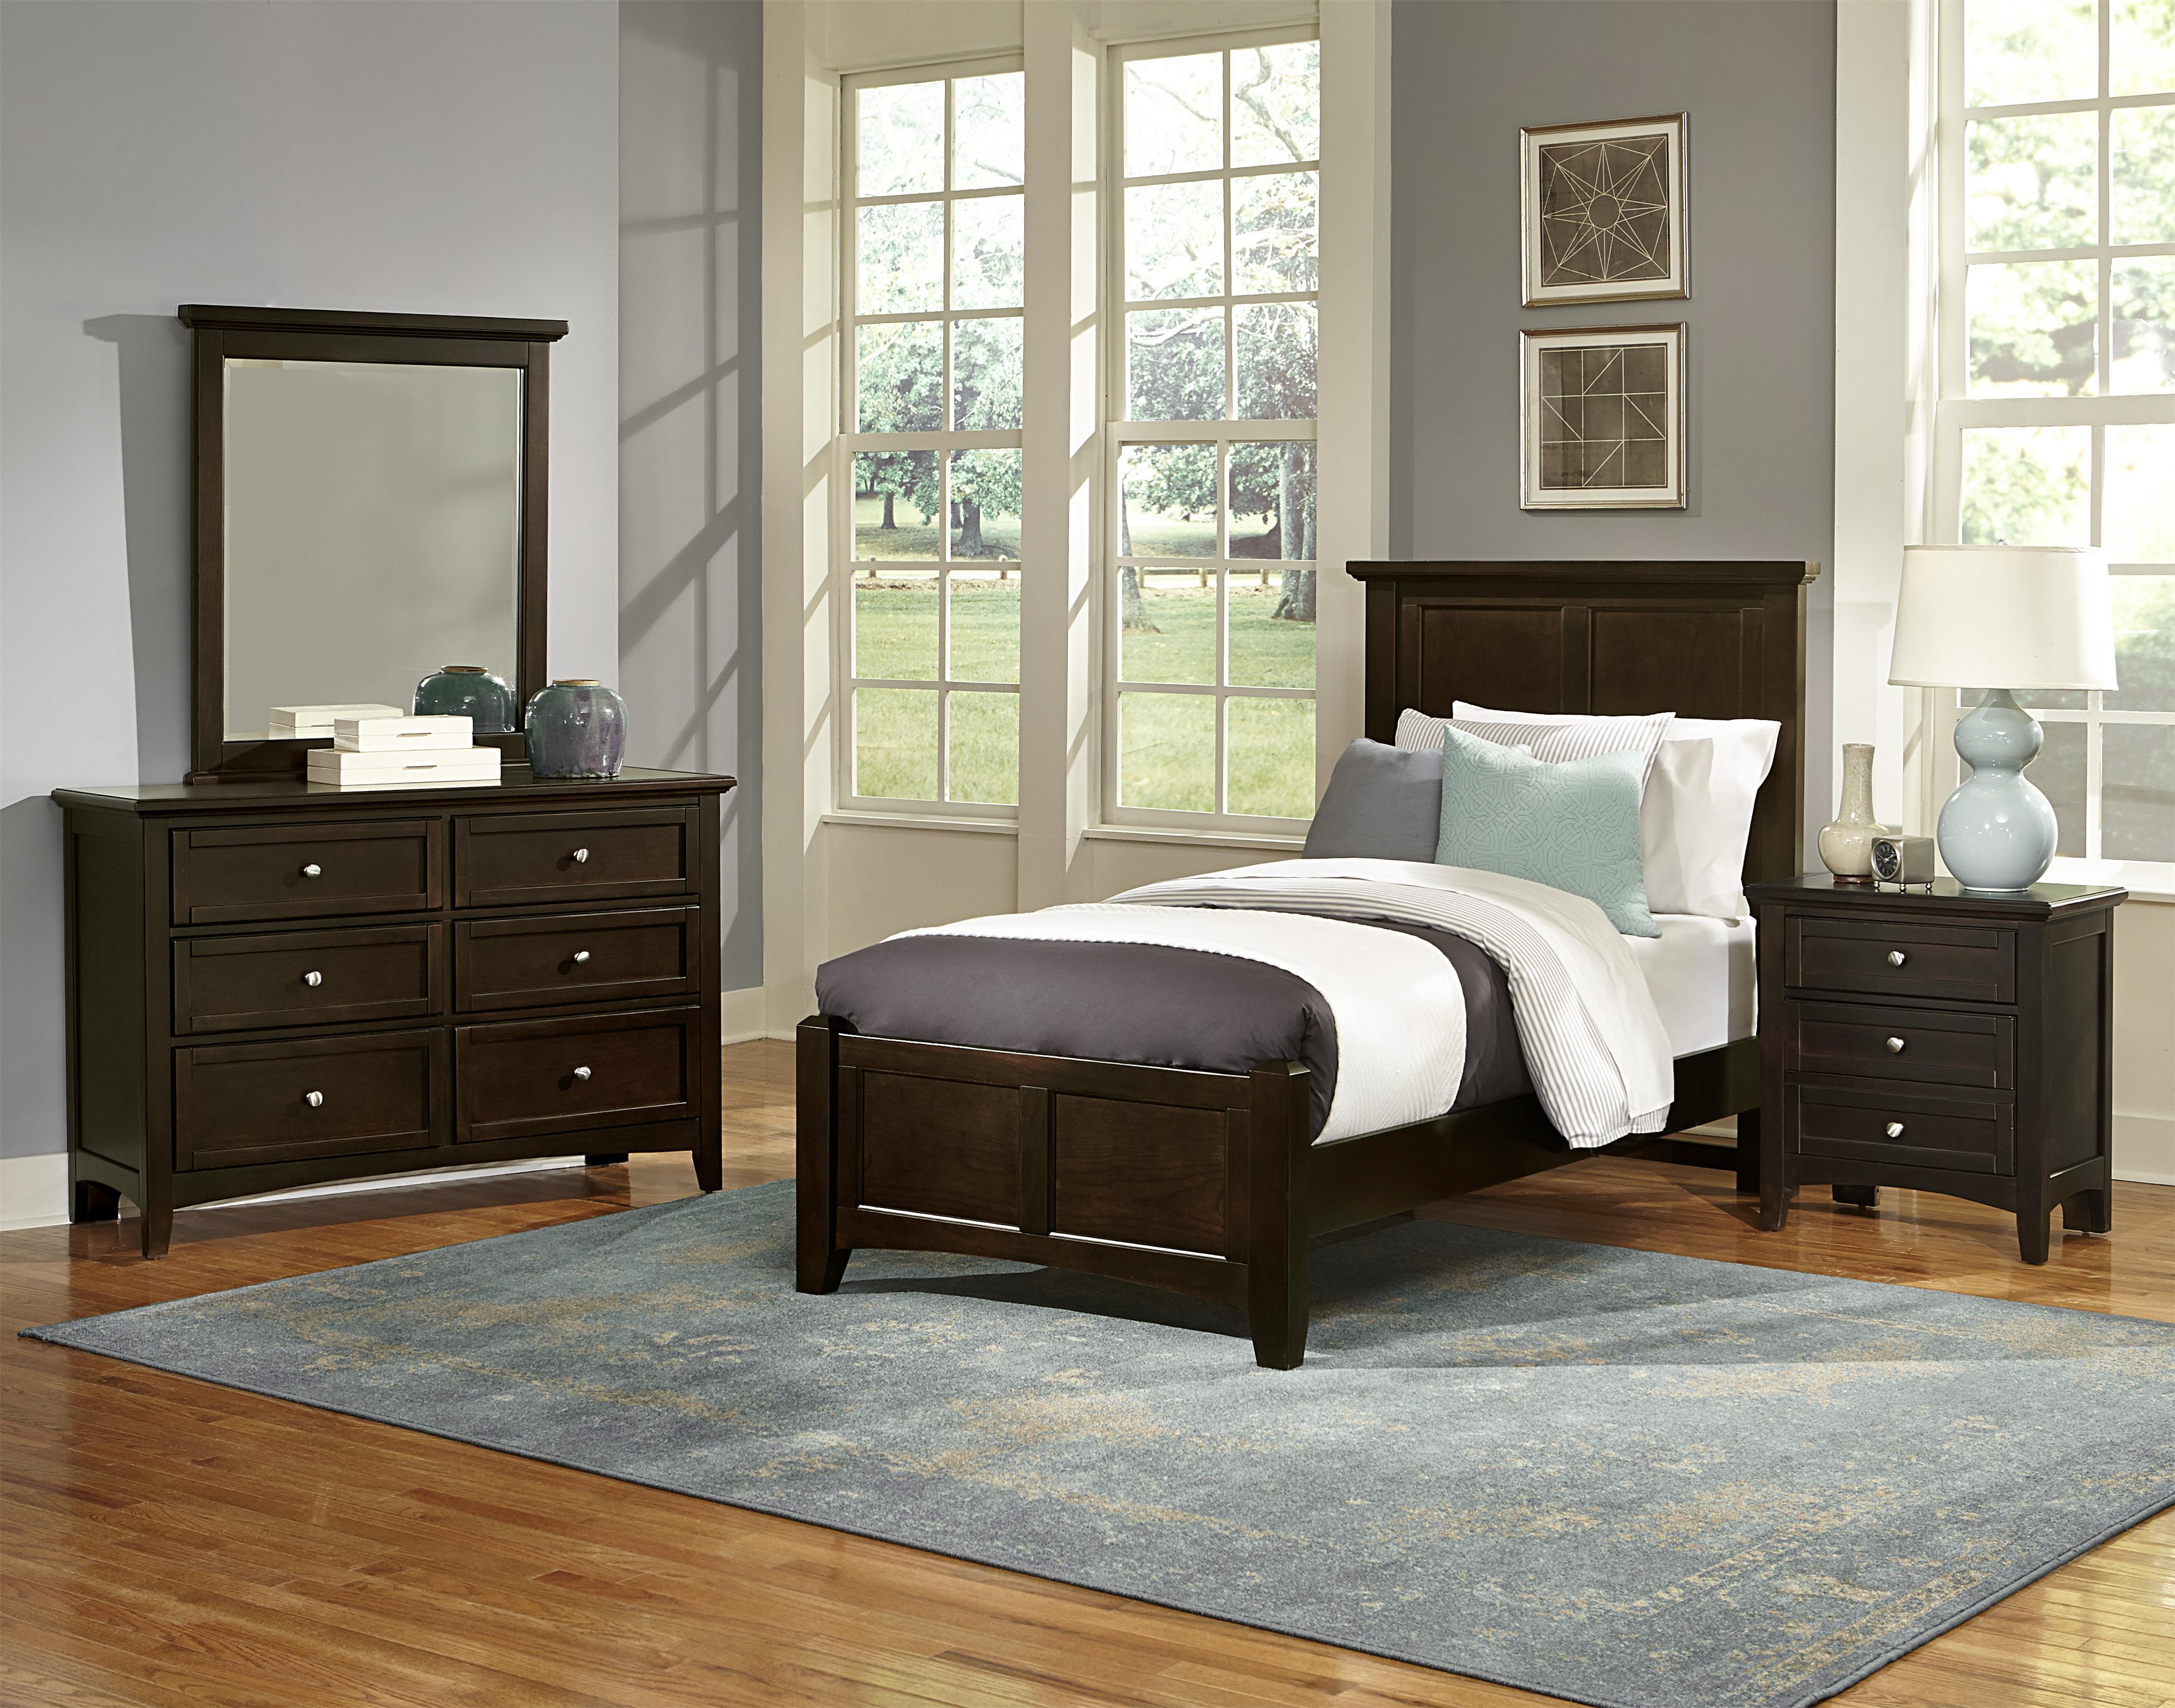 Bonanza Twin Bedroom Group by Vaughan Bassett at Mueller Furniture